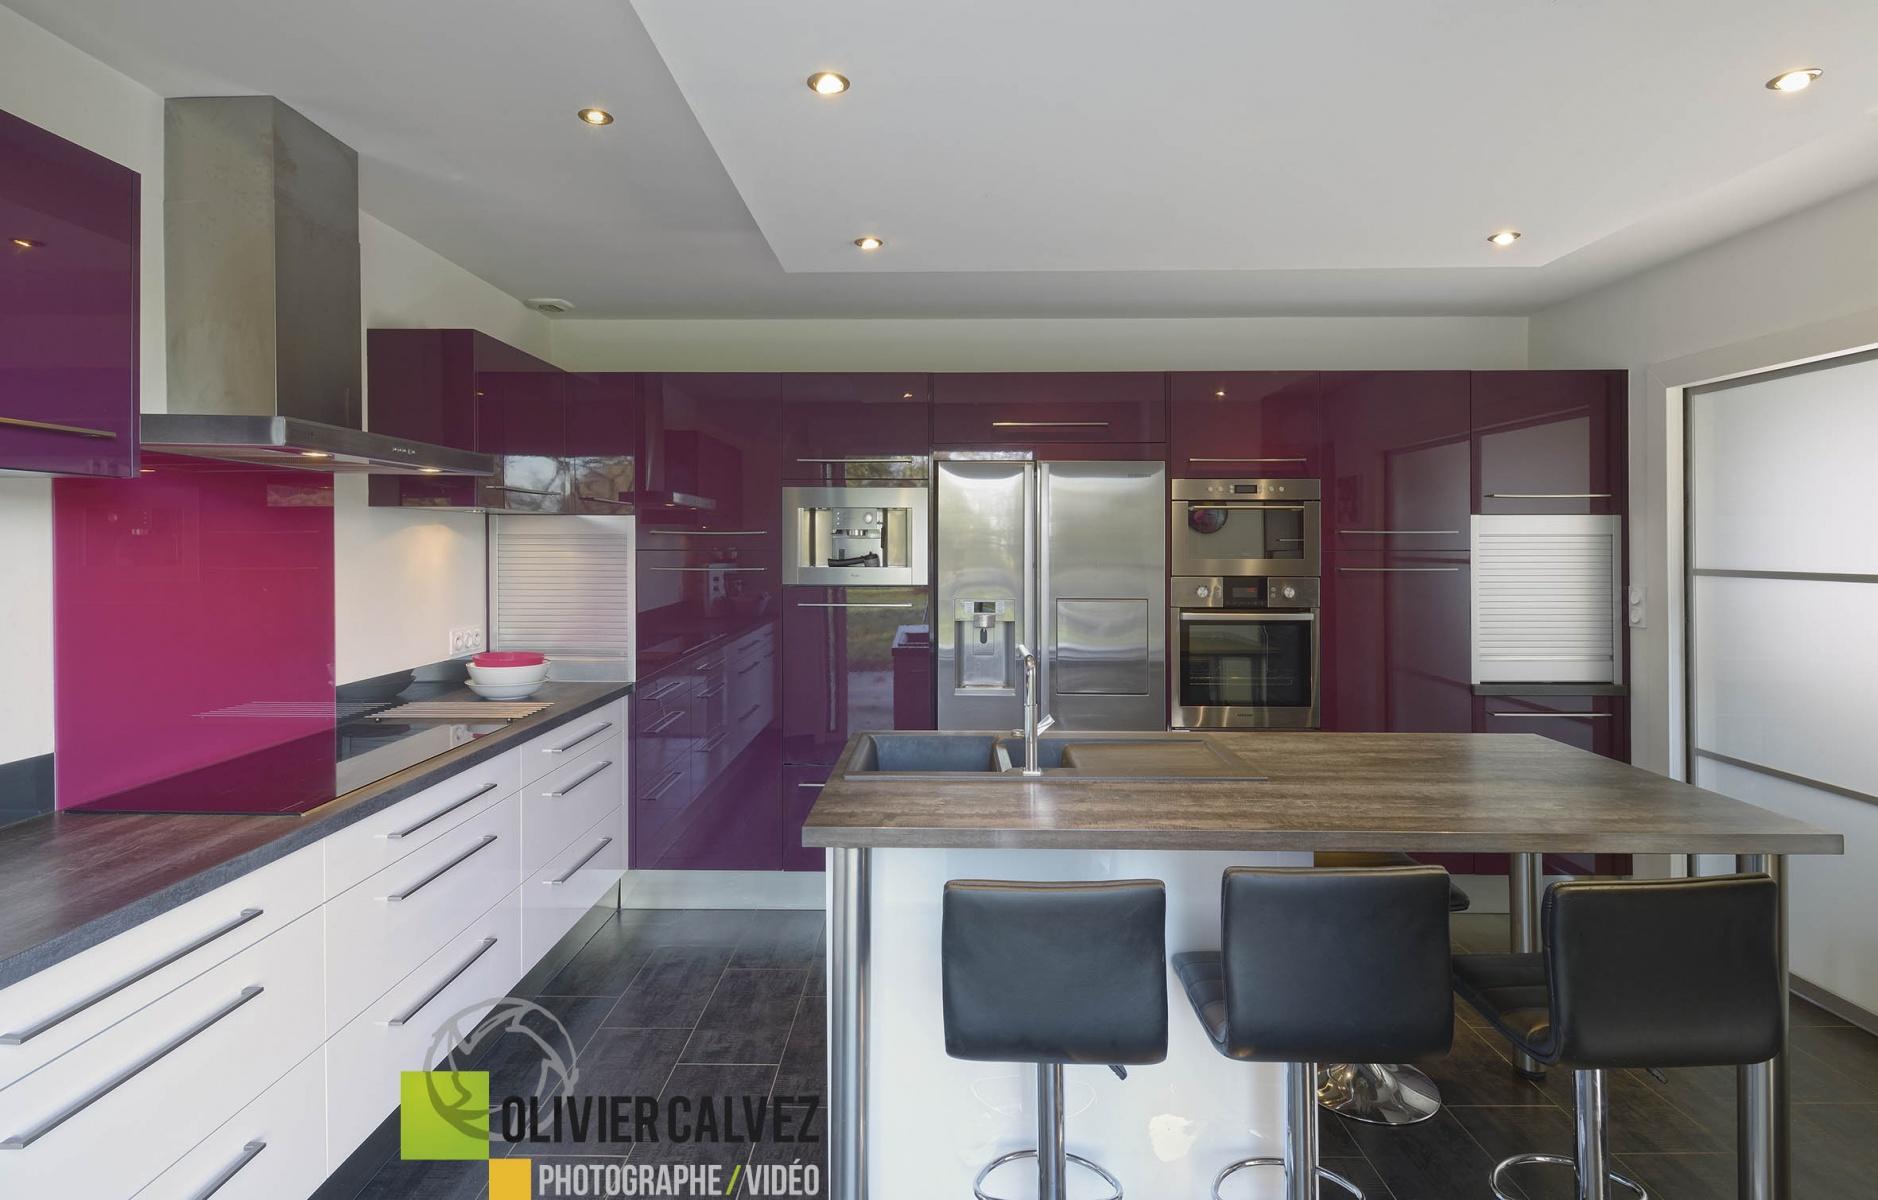 olivier calvez pyram industrie cuisine. Black Bedroom Furniture Sets. Home Design Ideas